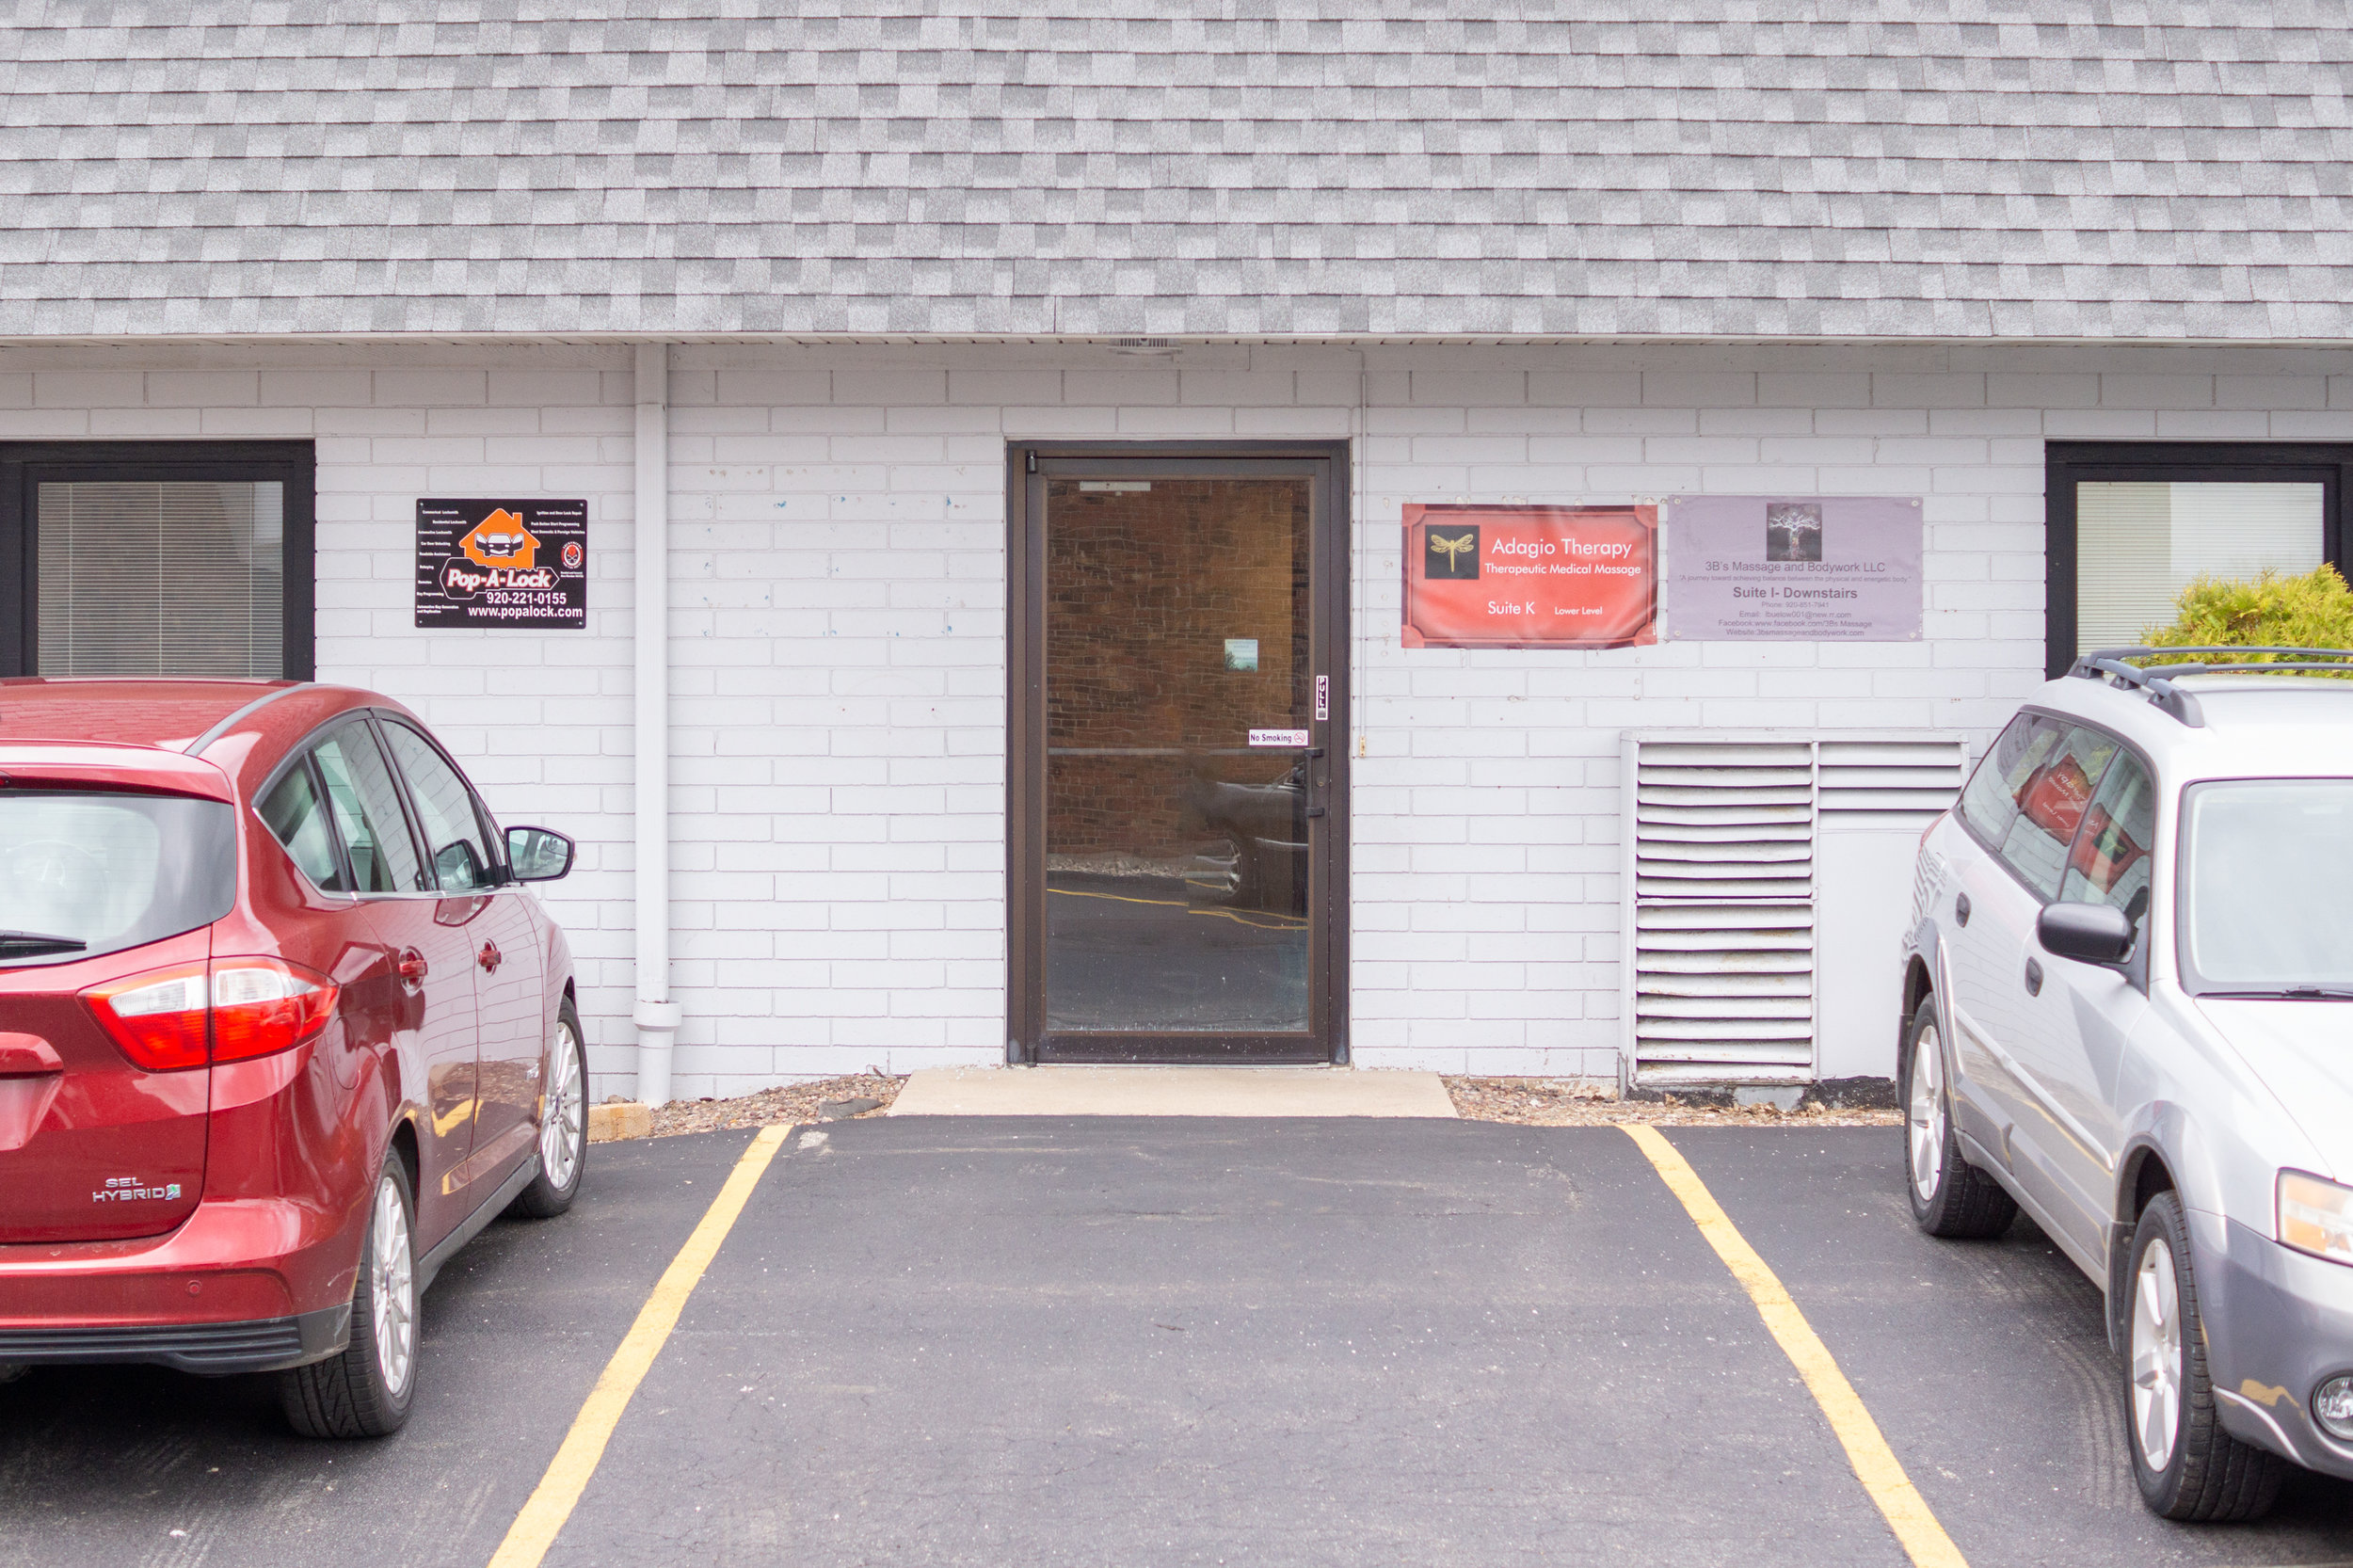 3B's Massage and Bodywork Entry Door